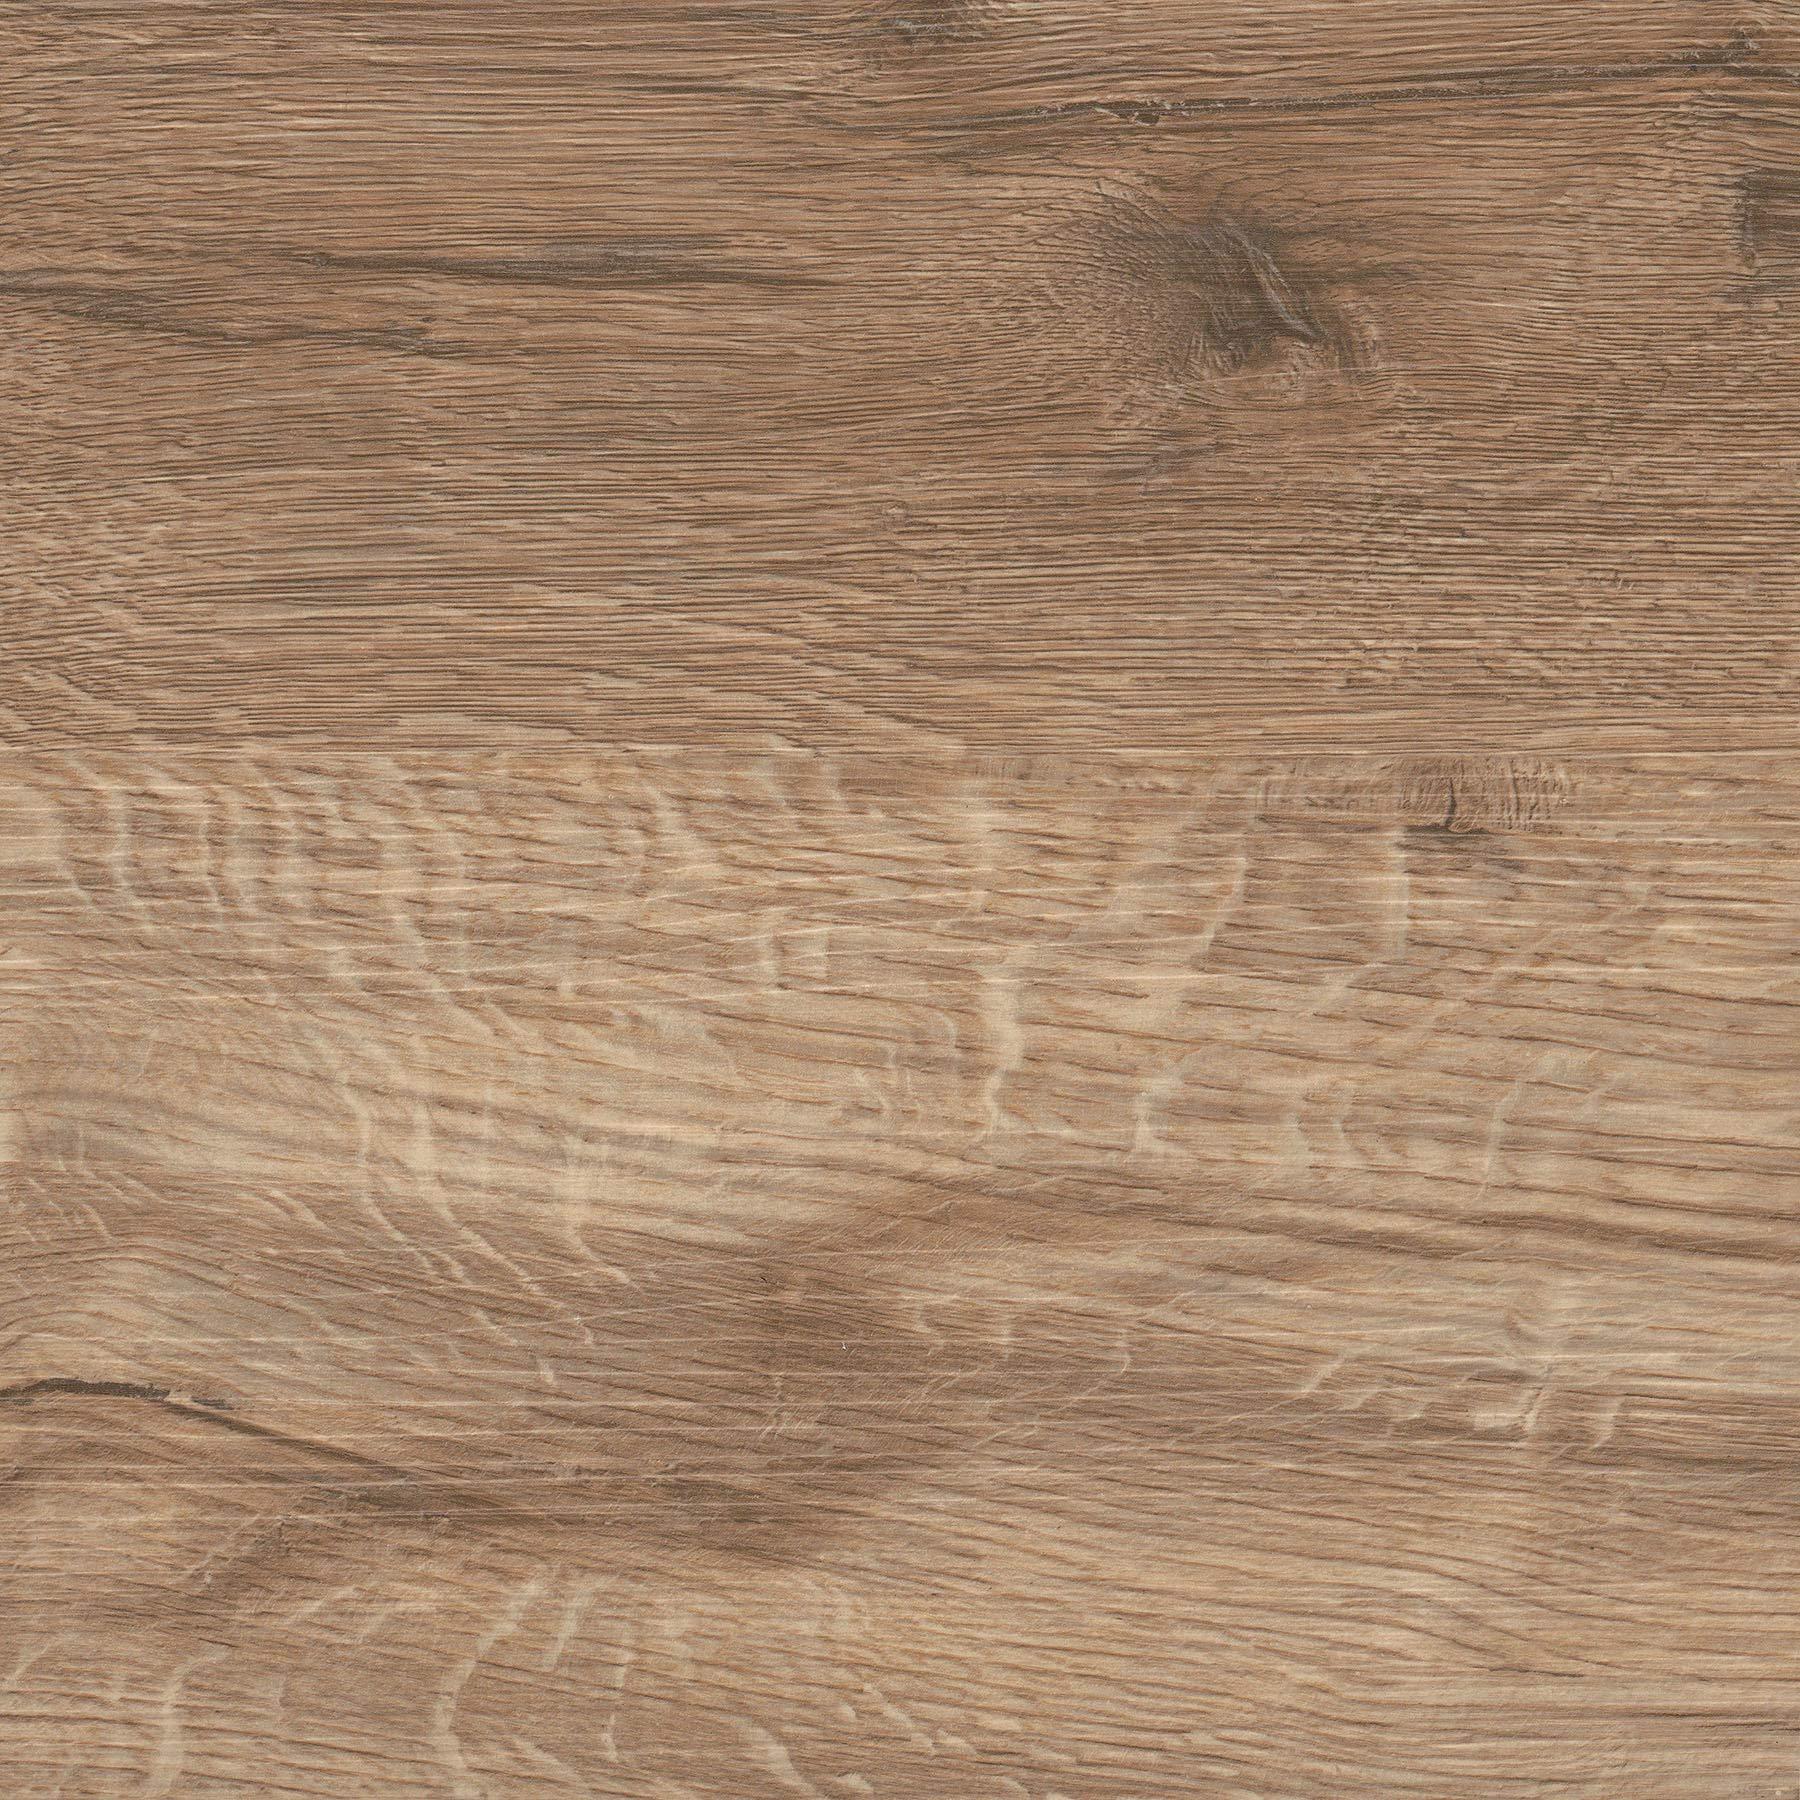 FloorPops FP3319 Pickling Peel & Stick Floor Tiles, Brown